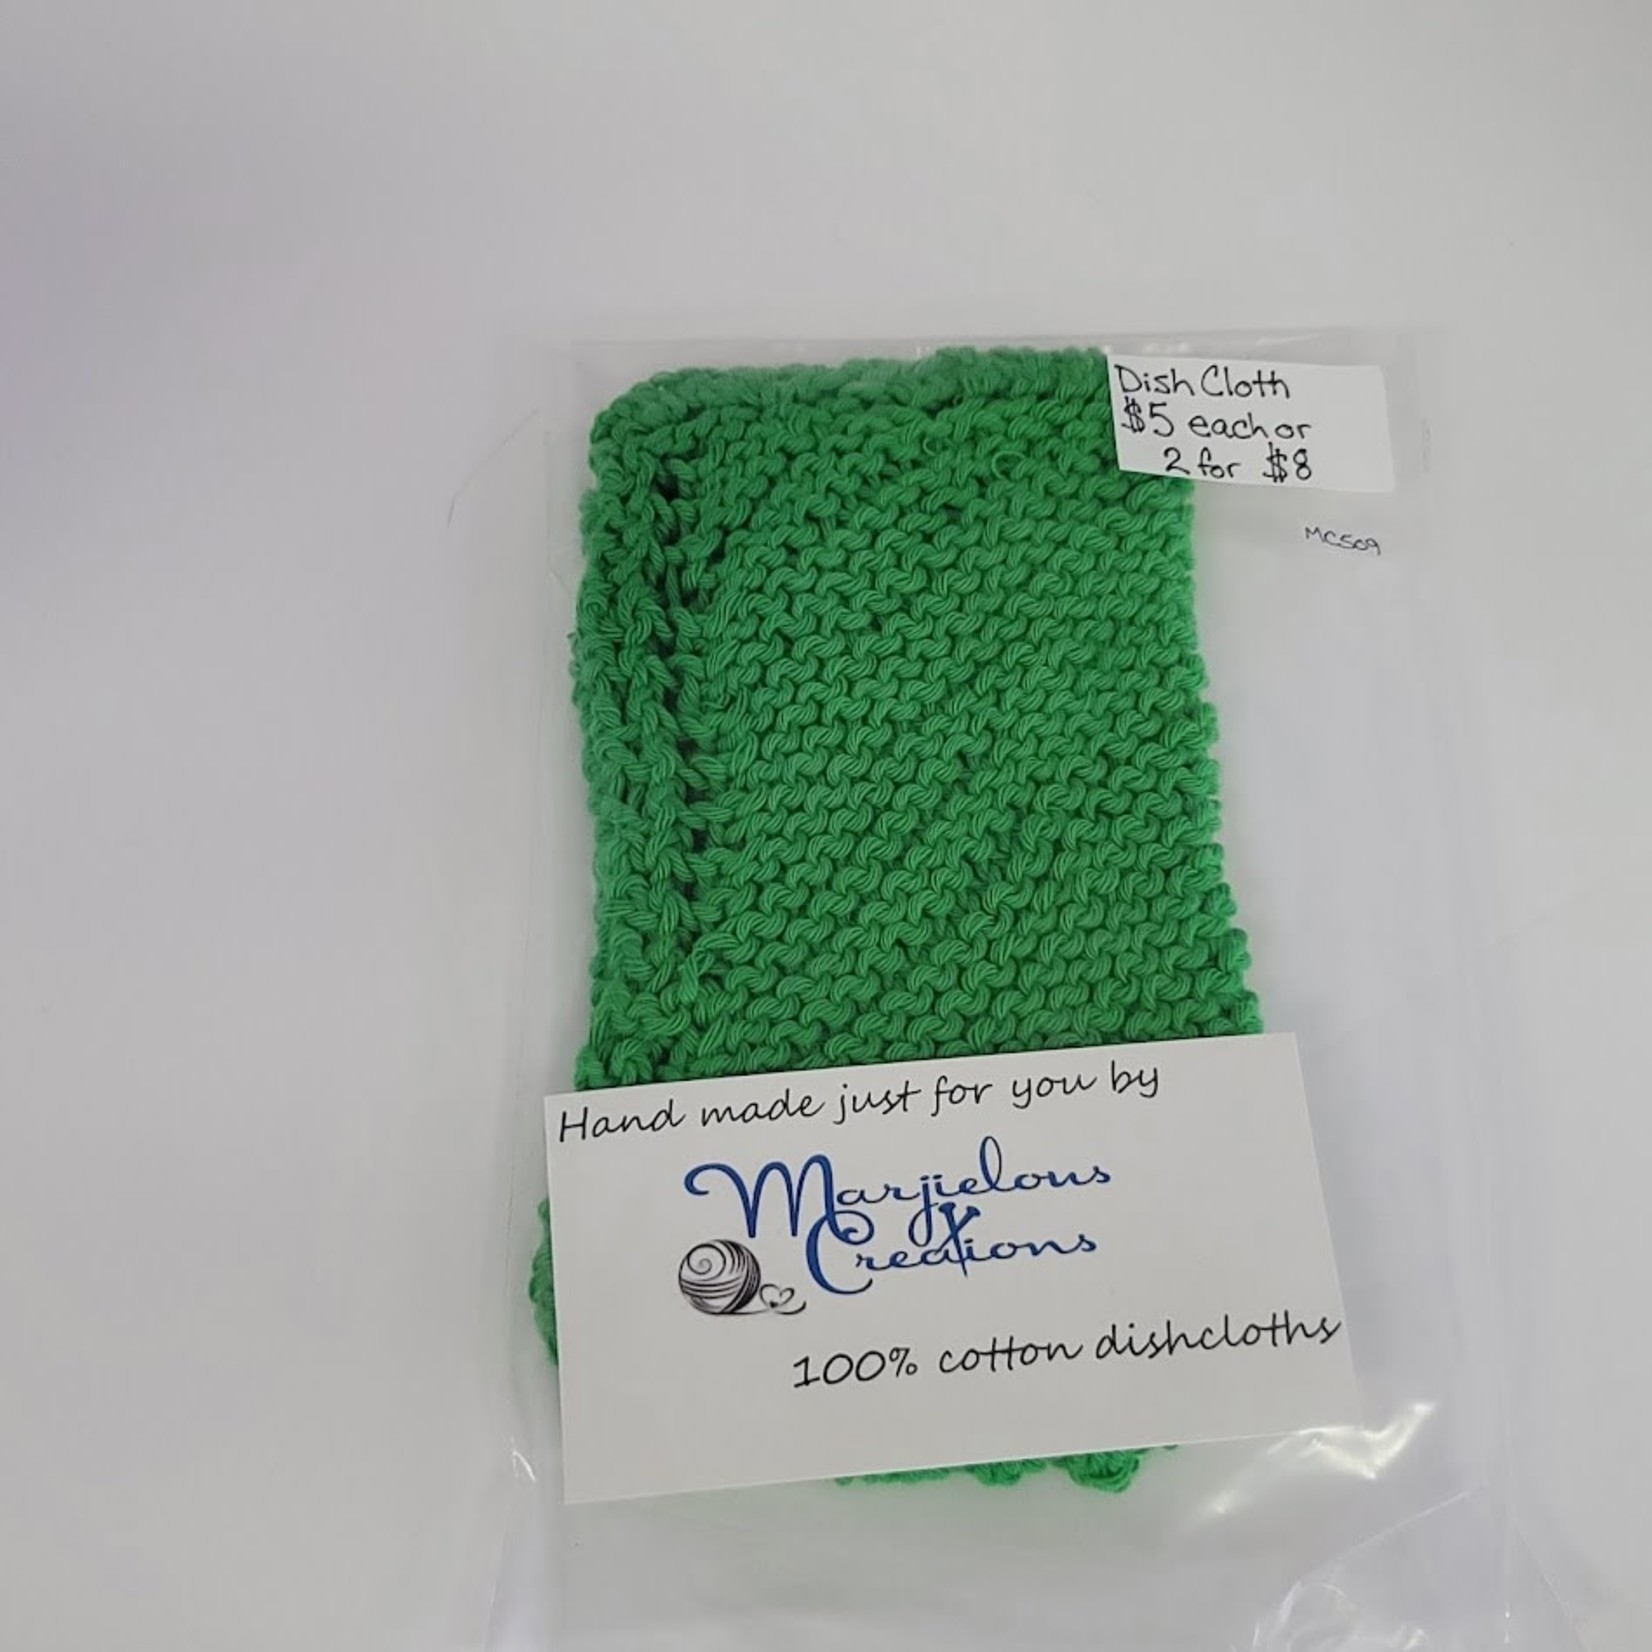 Marjielous Creations 100% Cotton Dishcloth